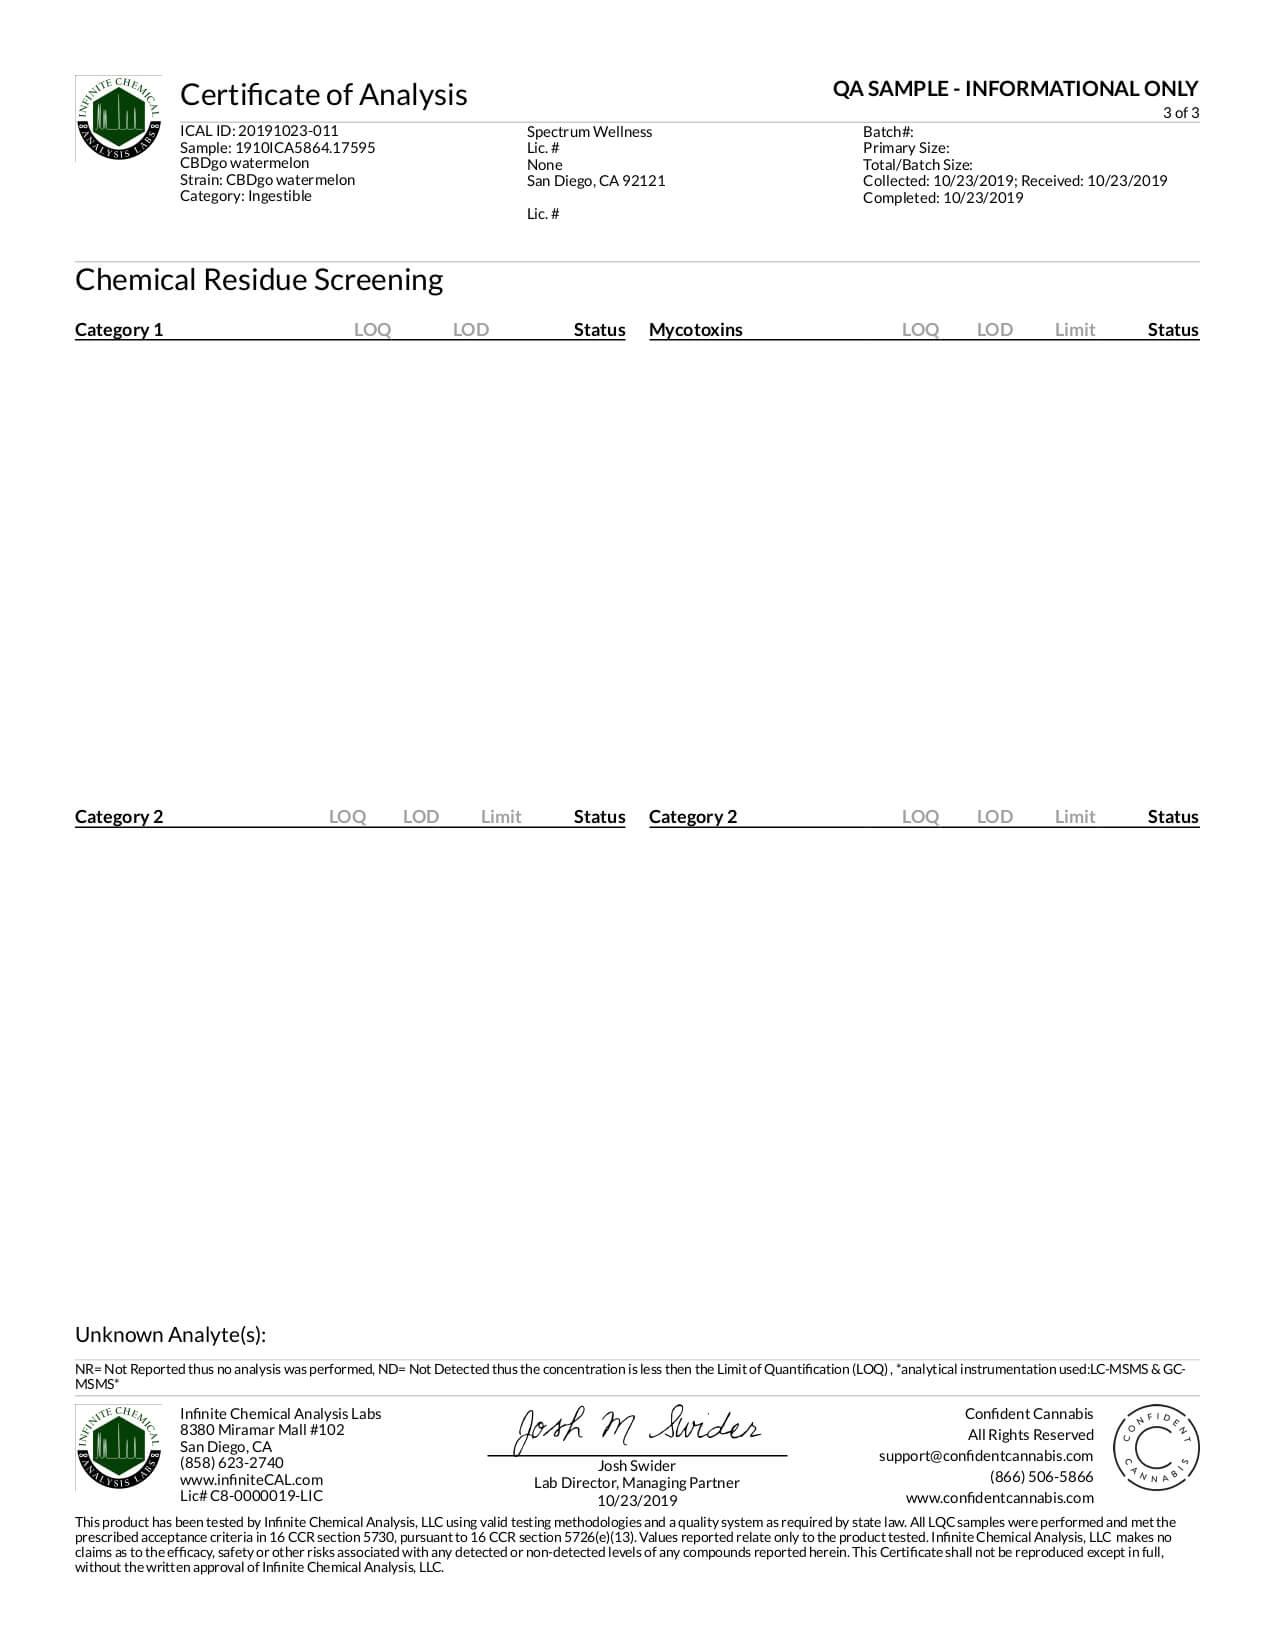 CBDgo CBD Drink Day/Night 12 Pack Watermelon Shot Lab Report